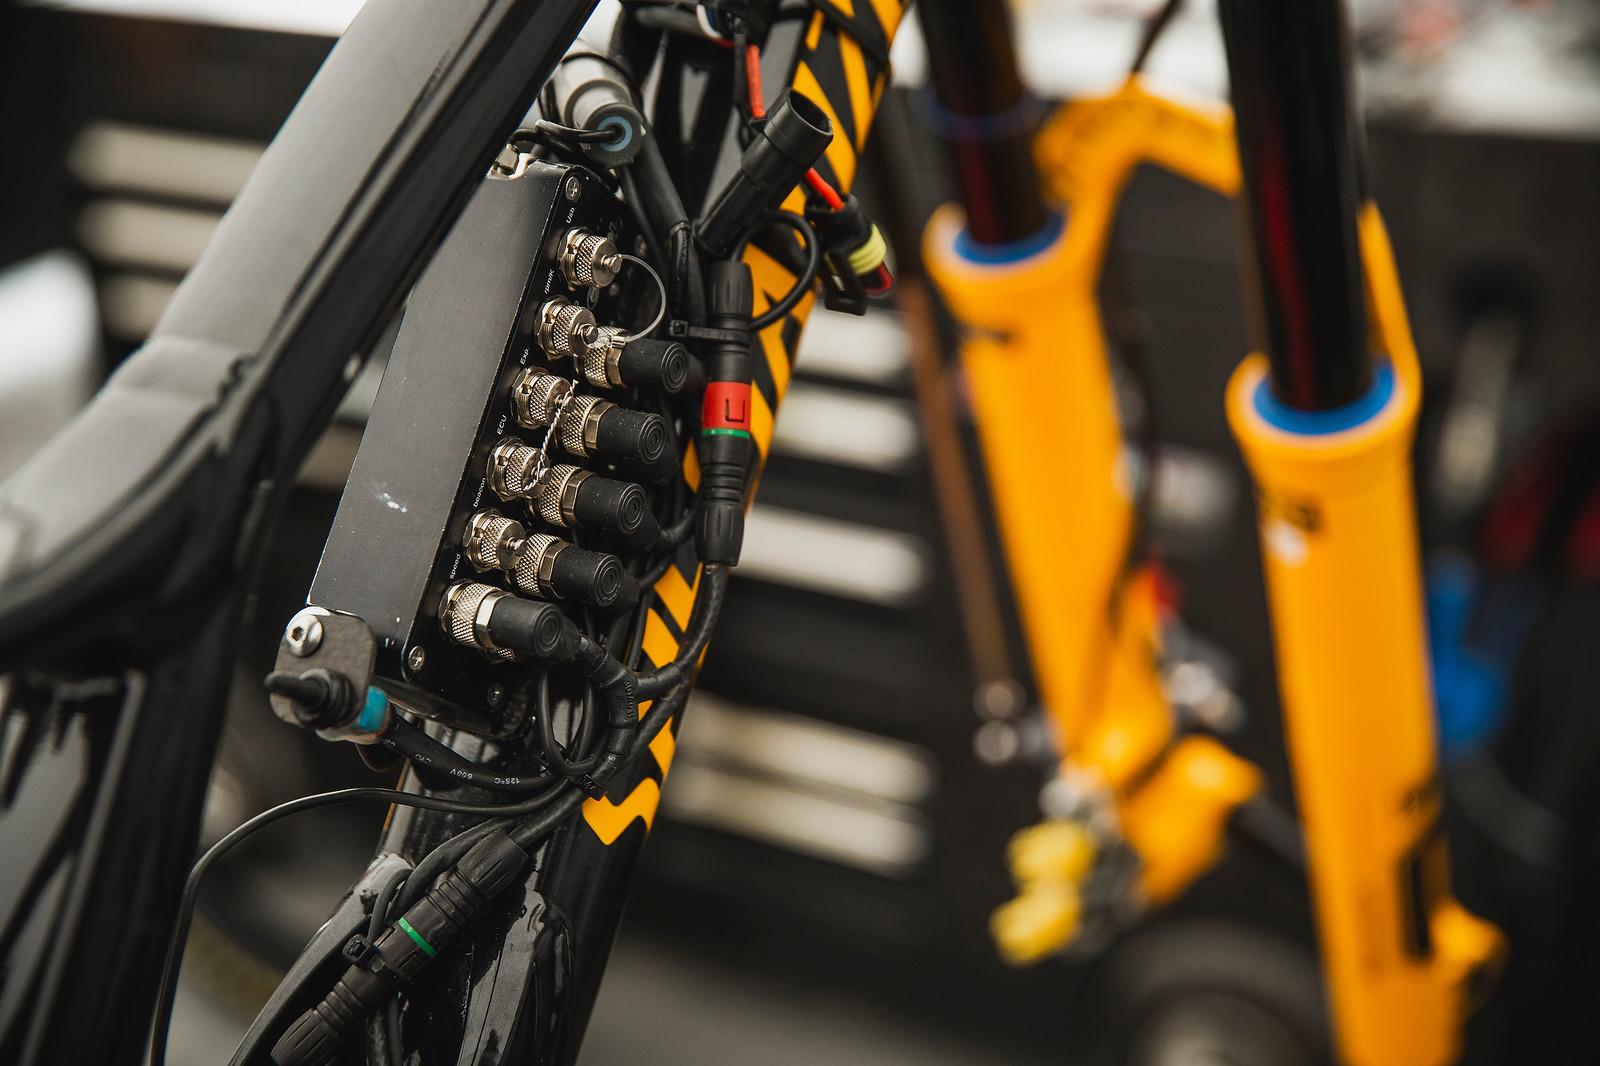 Loic's data acquisition bike.